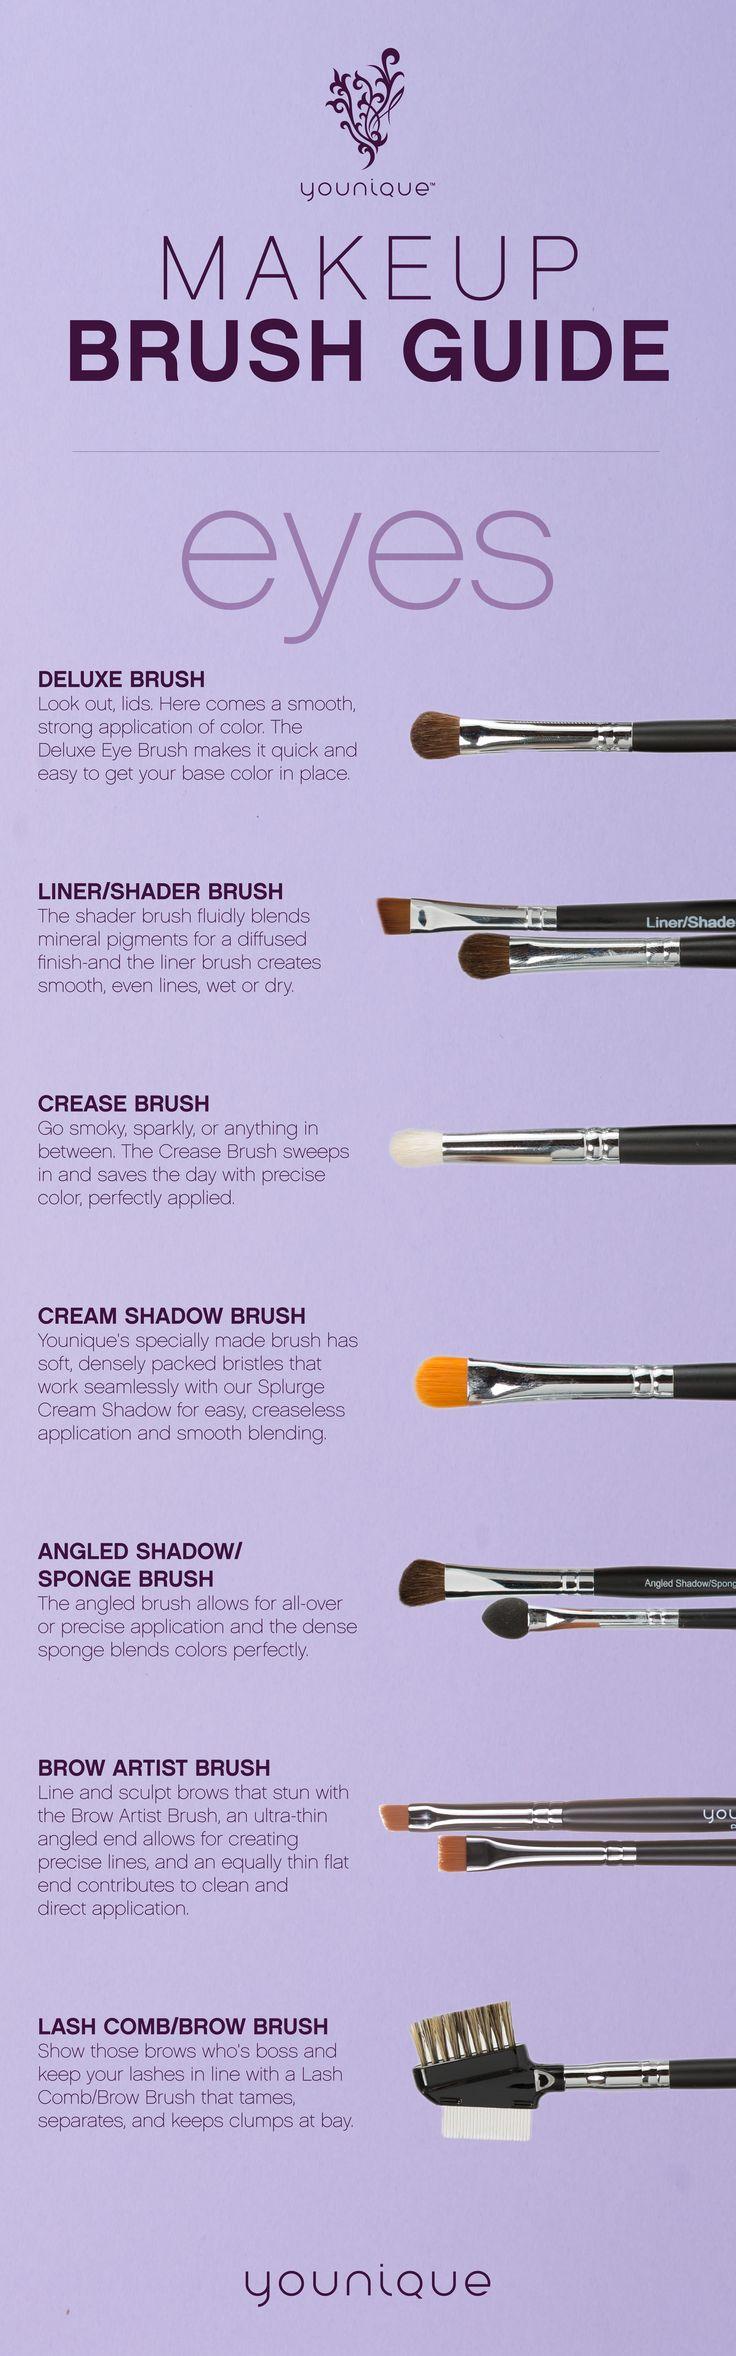 best best makeup for wedding images on pinterest make up looks